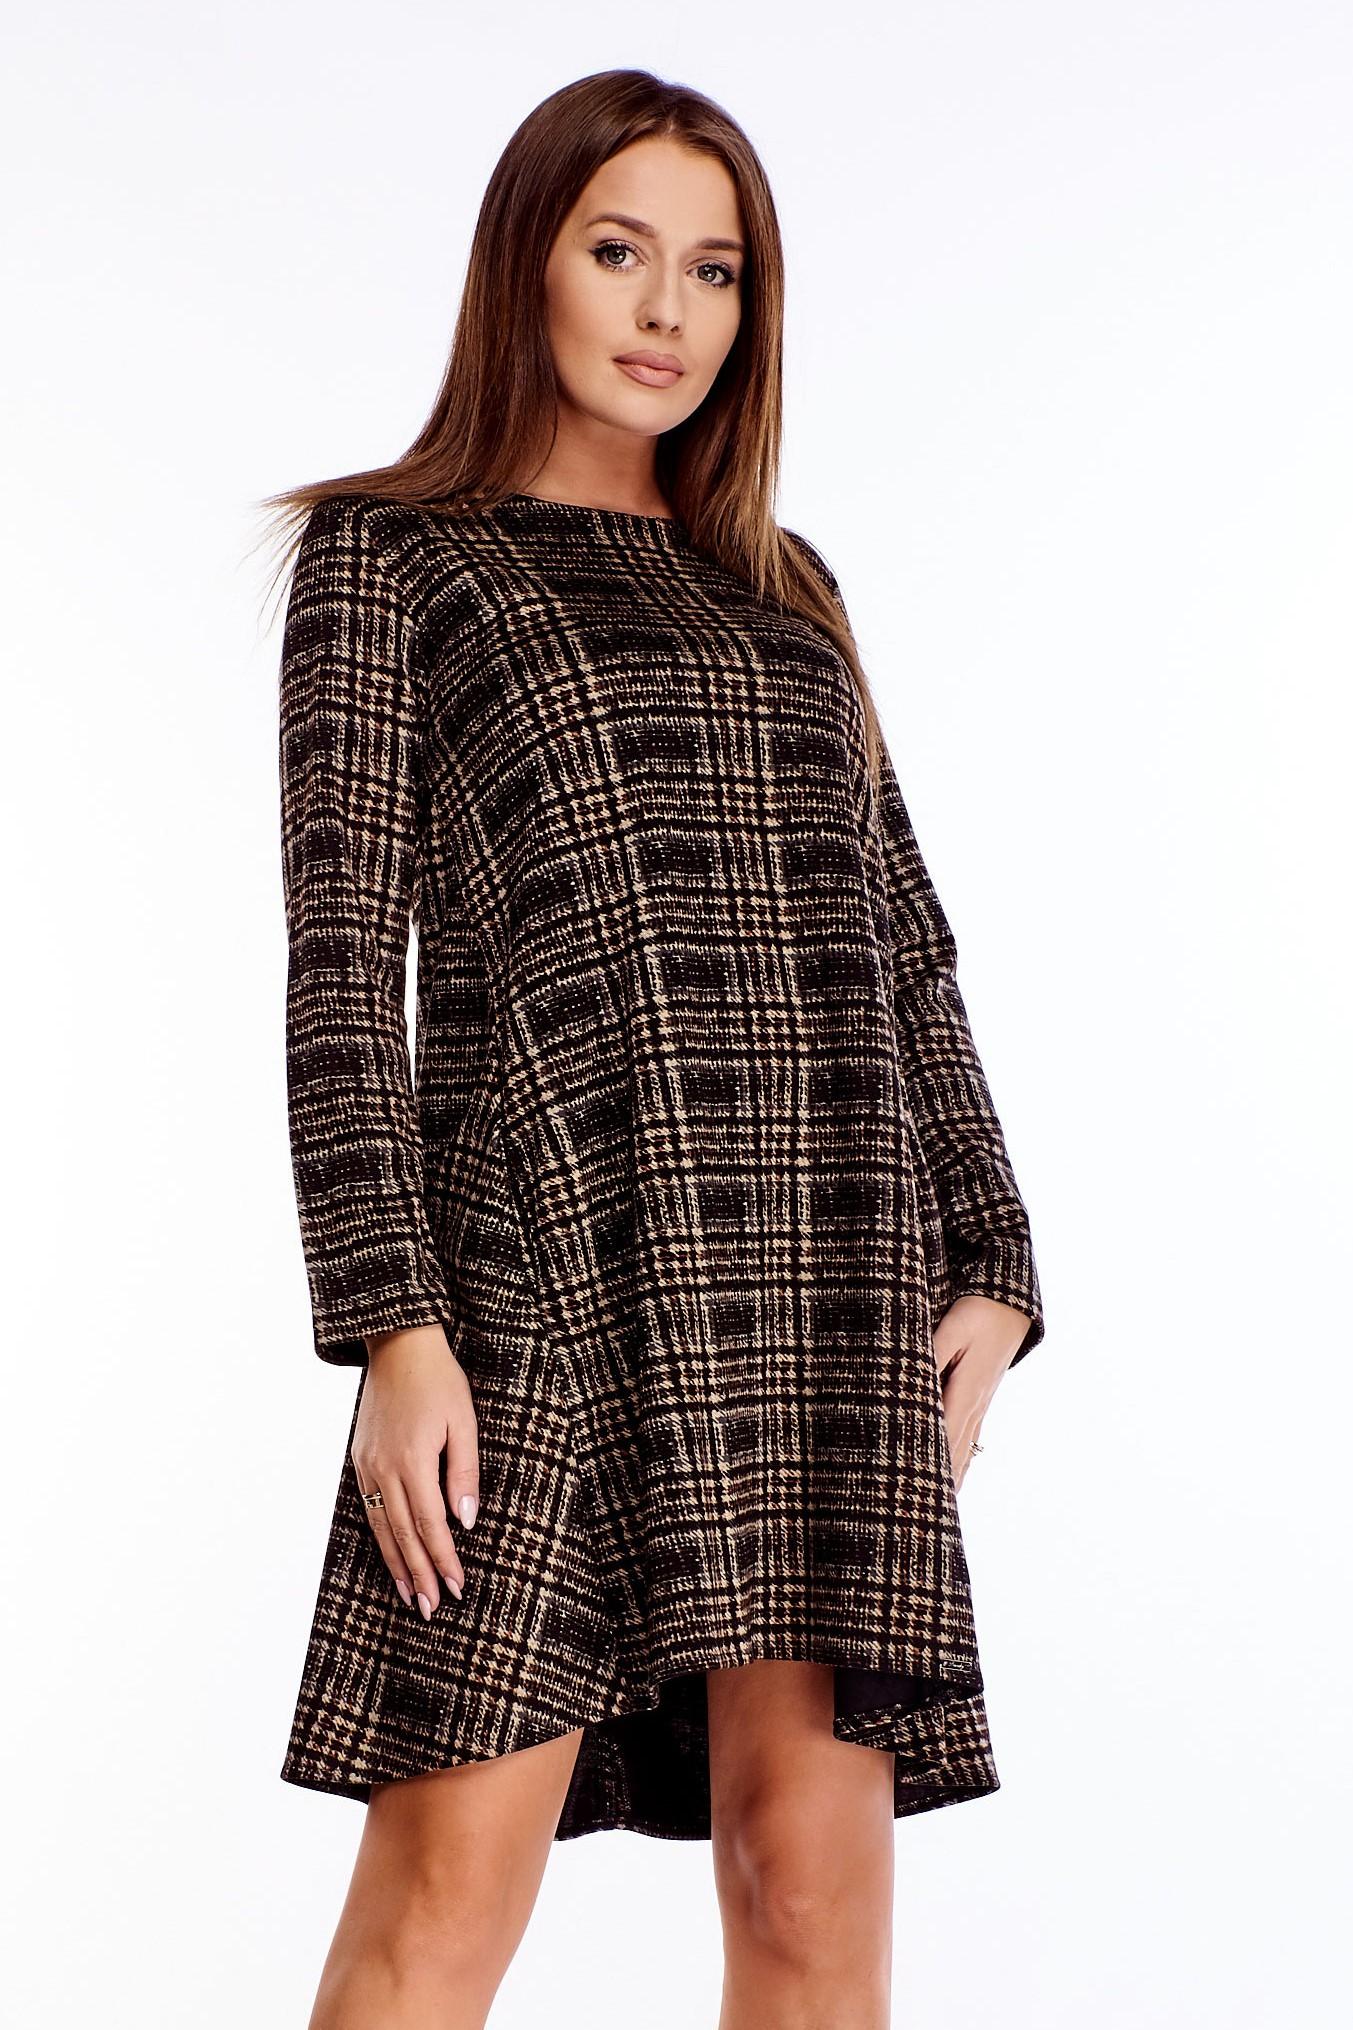 Krátke bavlnené oversize šaty s károvaným vzorom - 2